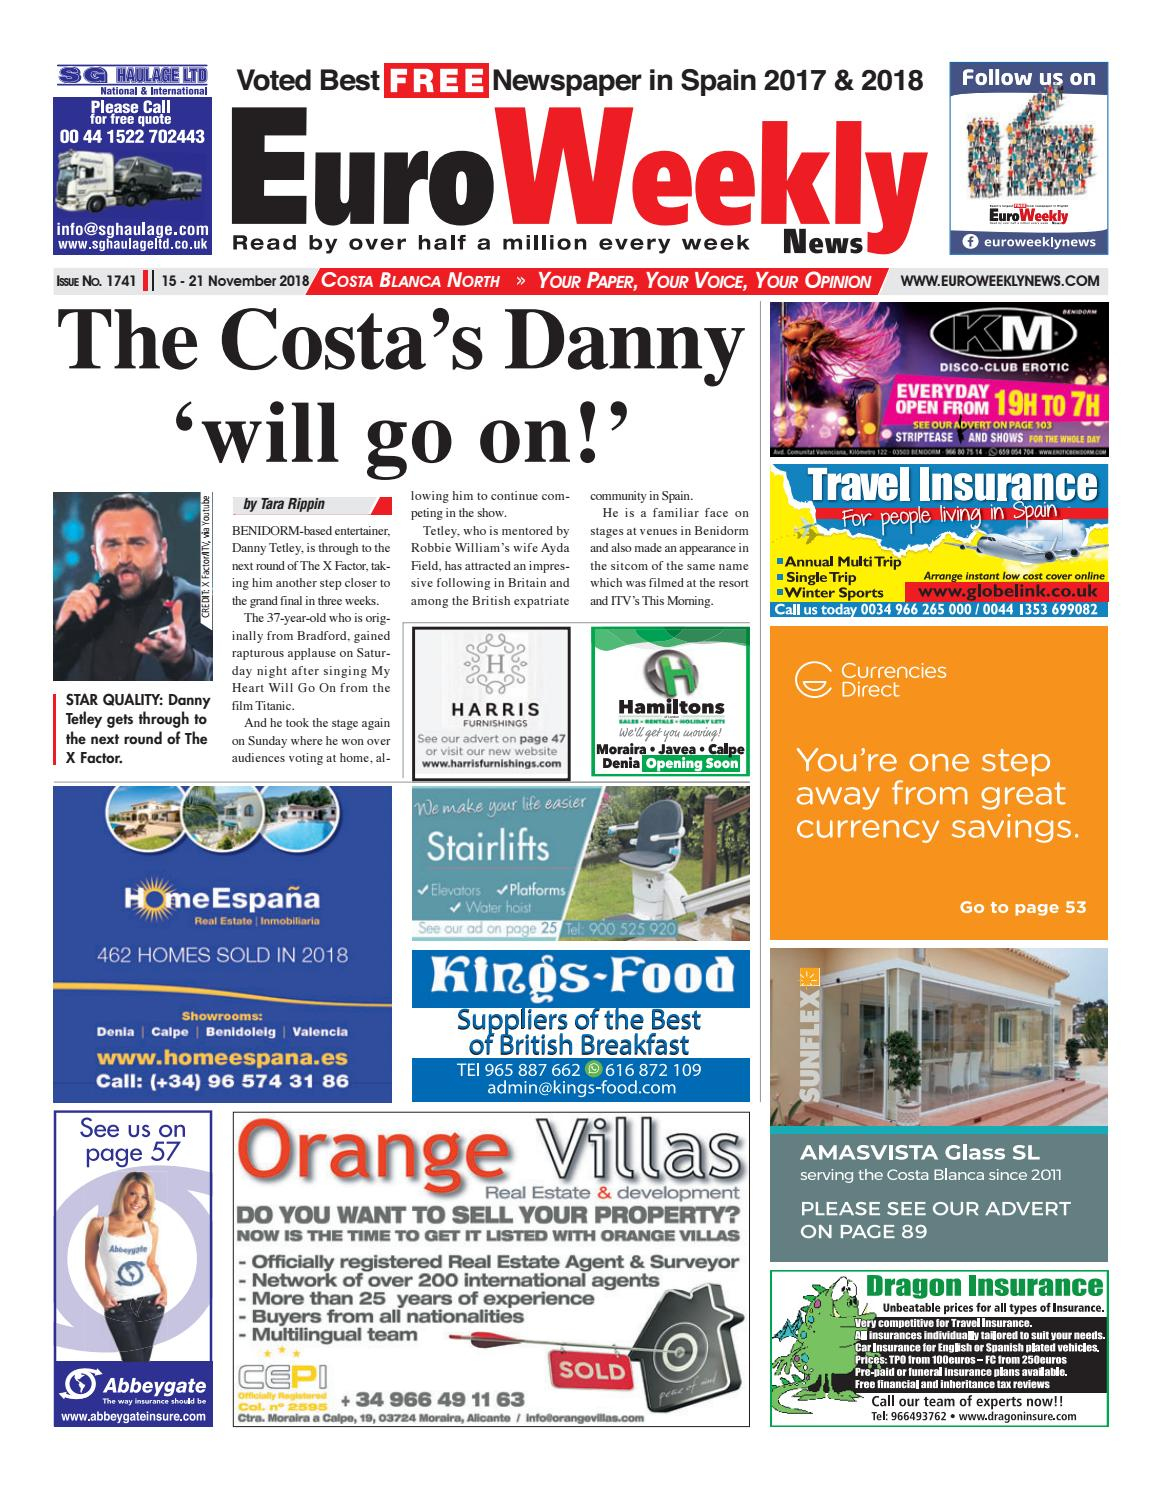 1c51ebe9 Euro Weekly News - Costa Blanca North 15-21 November 2018 Issue 1741 by  Euro Weekly News Media S.A. - issuu